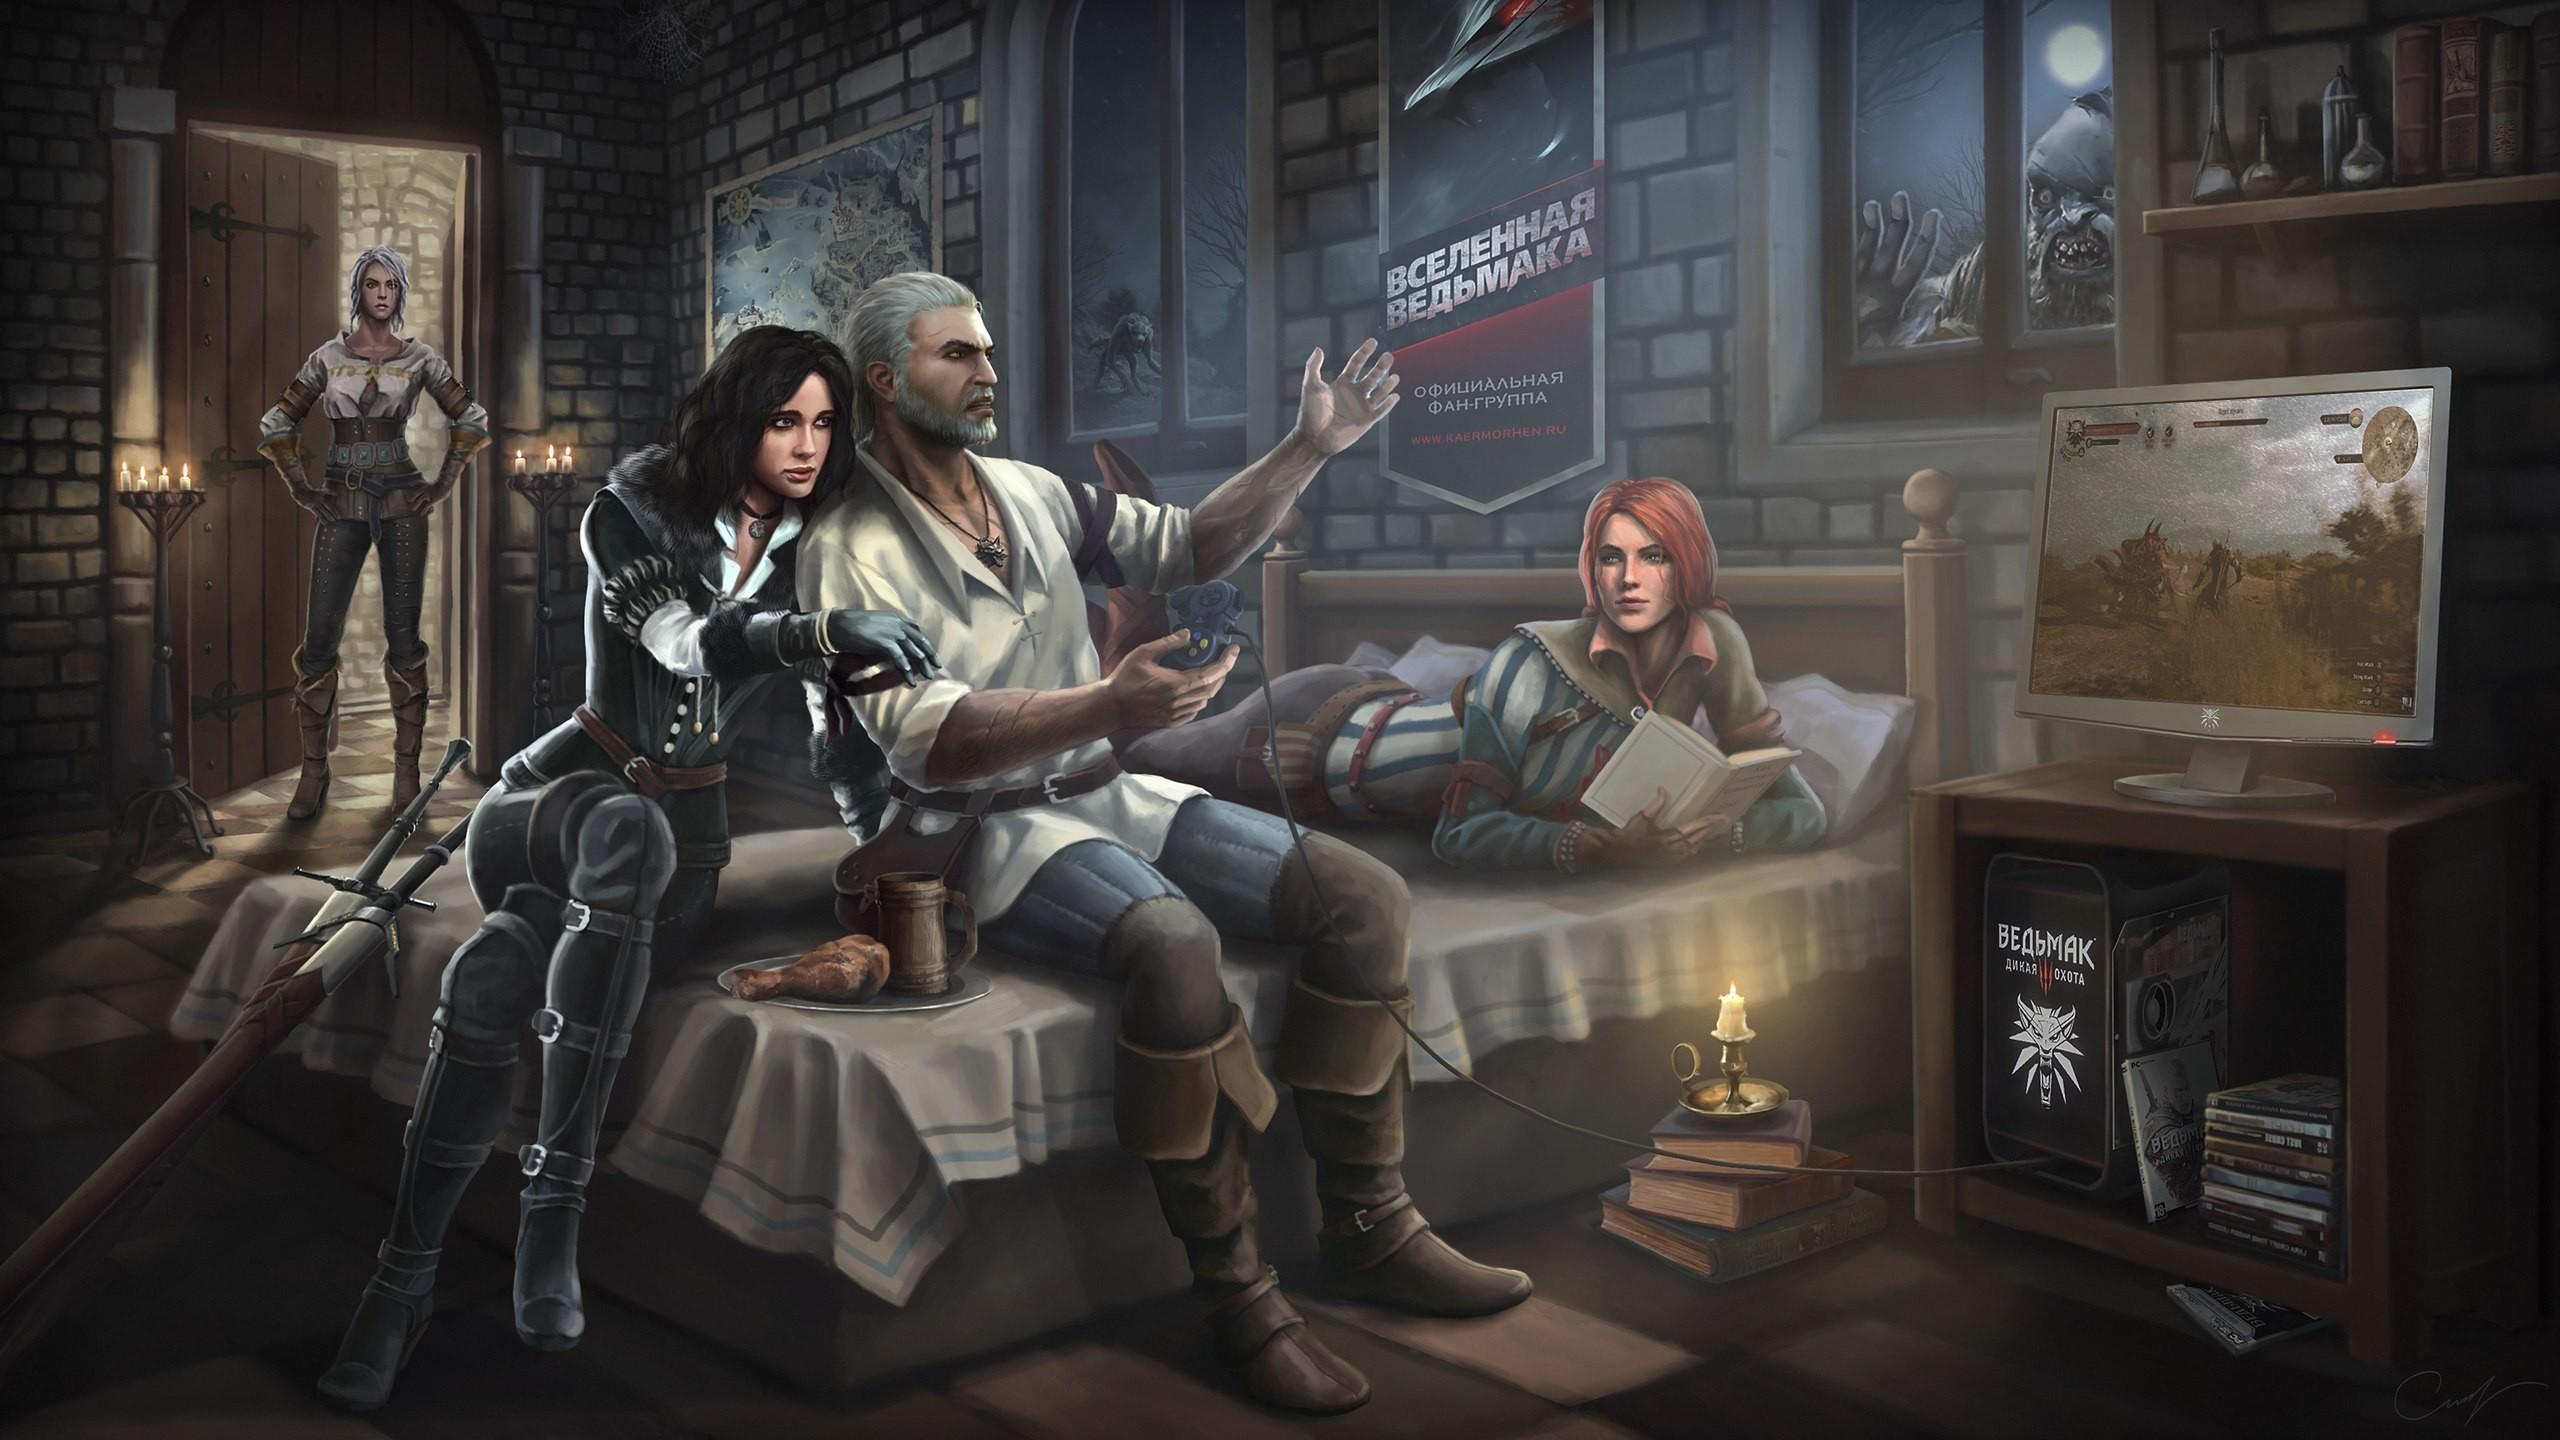 The-Witcher-3-Wild-Hunt-Gentral-HD-Wallpaper.jpg (JPEG obrázek, 2560 × 1440  bodů) – Měřítko (65%) | Witcher 3 Wild Hunt | Pinterest | Wild hunt and …